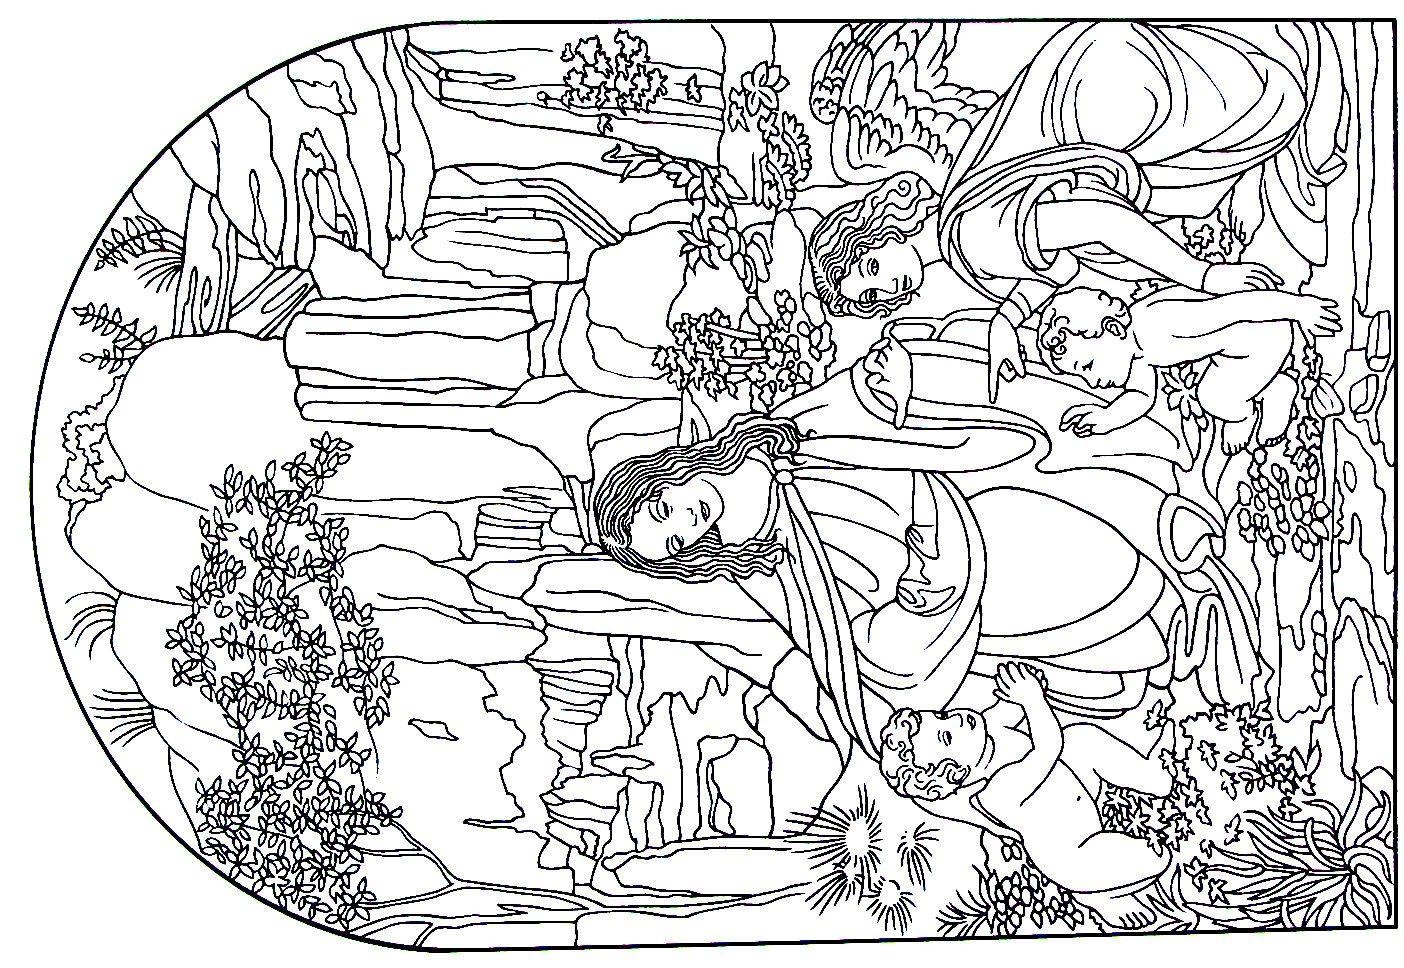 Virgin Of The Rocks Painting By Leonardo Da Vinci